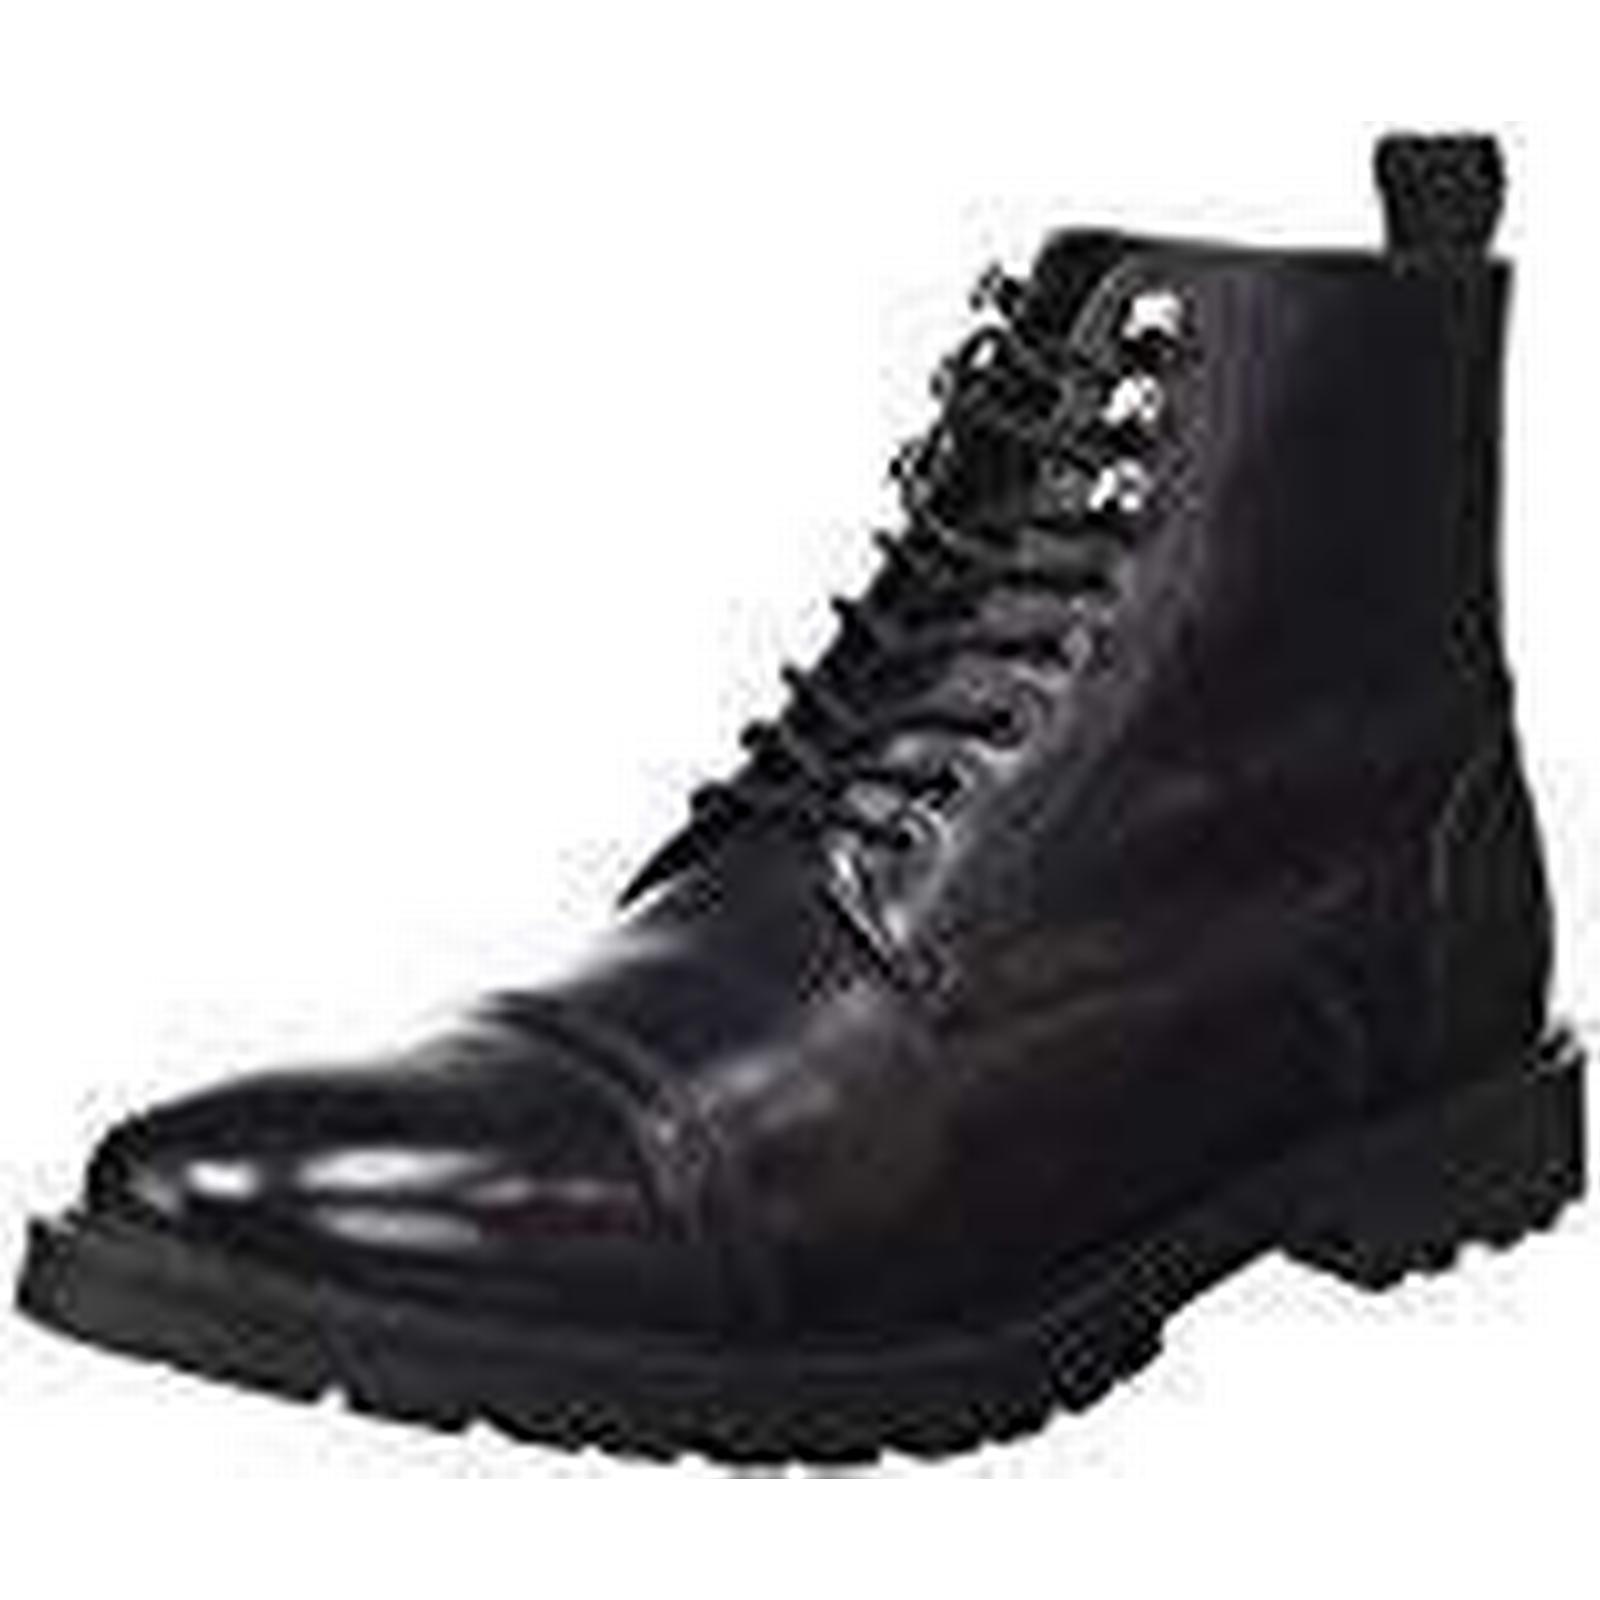 Base Boots London Mens RP04 Boots Base Black Size: 10 UK df4ea1